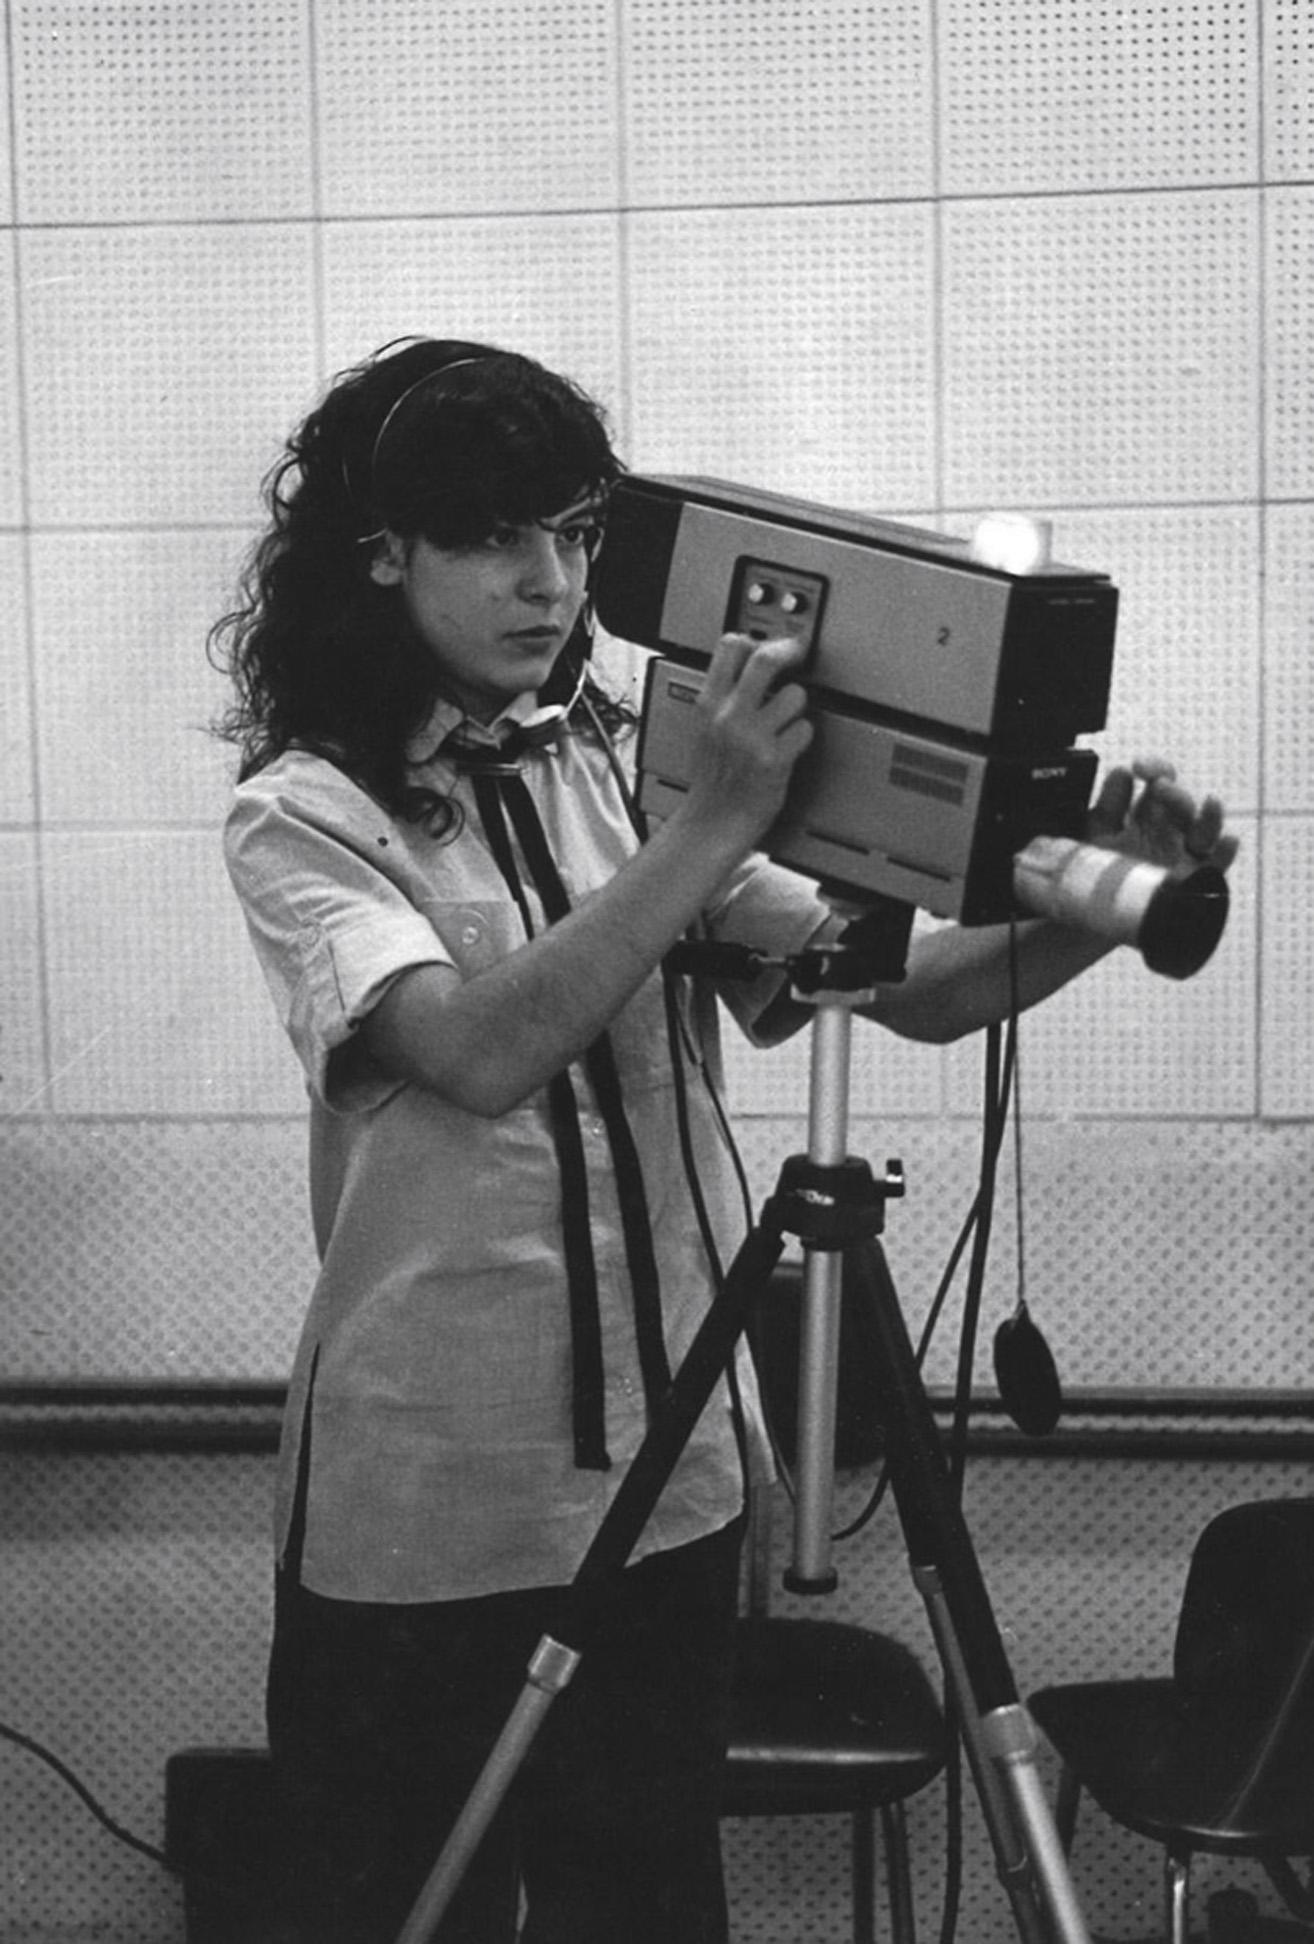 Aos 18 anos, no curso de jornalismo, na Universidade de Brasília.